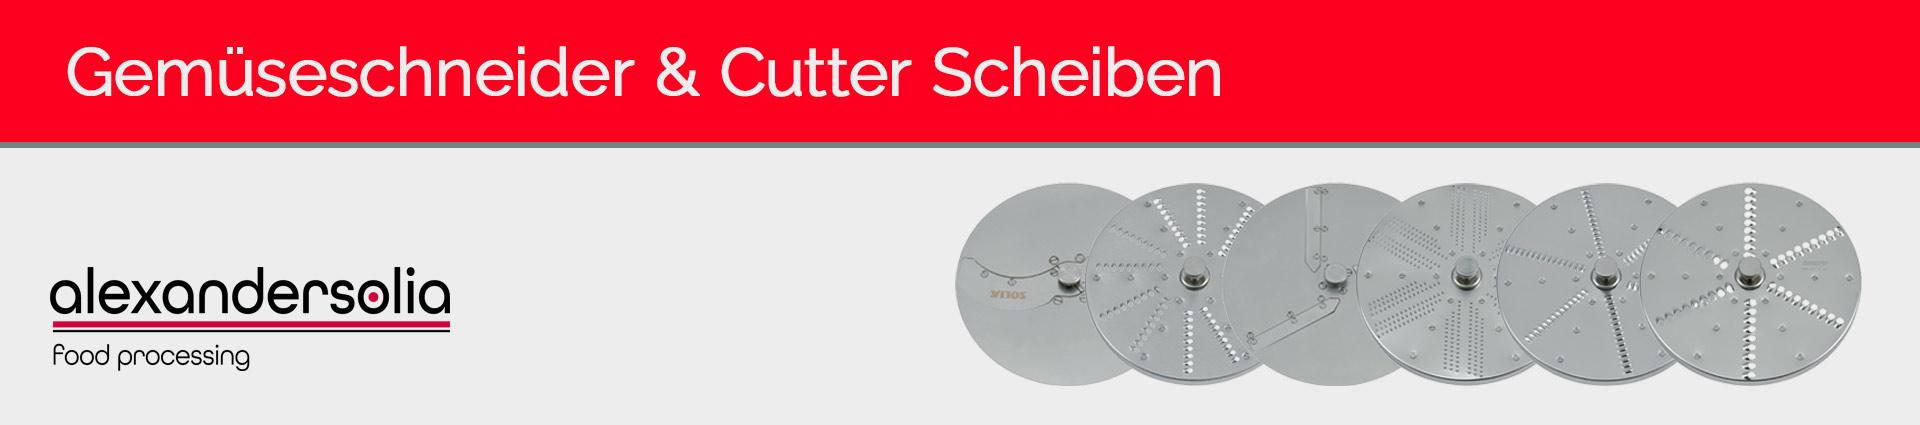 AlexanderSolia Gemüseschneider & Cutter Scheiben Banner